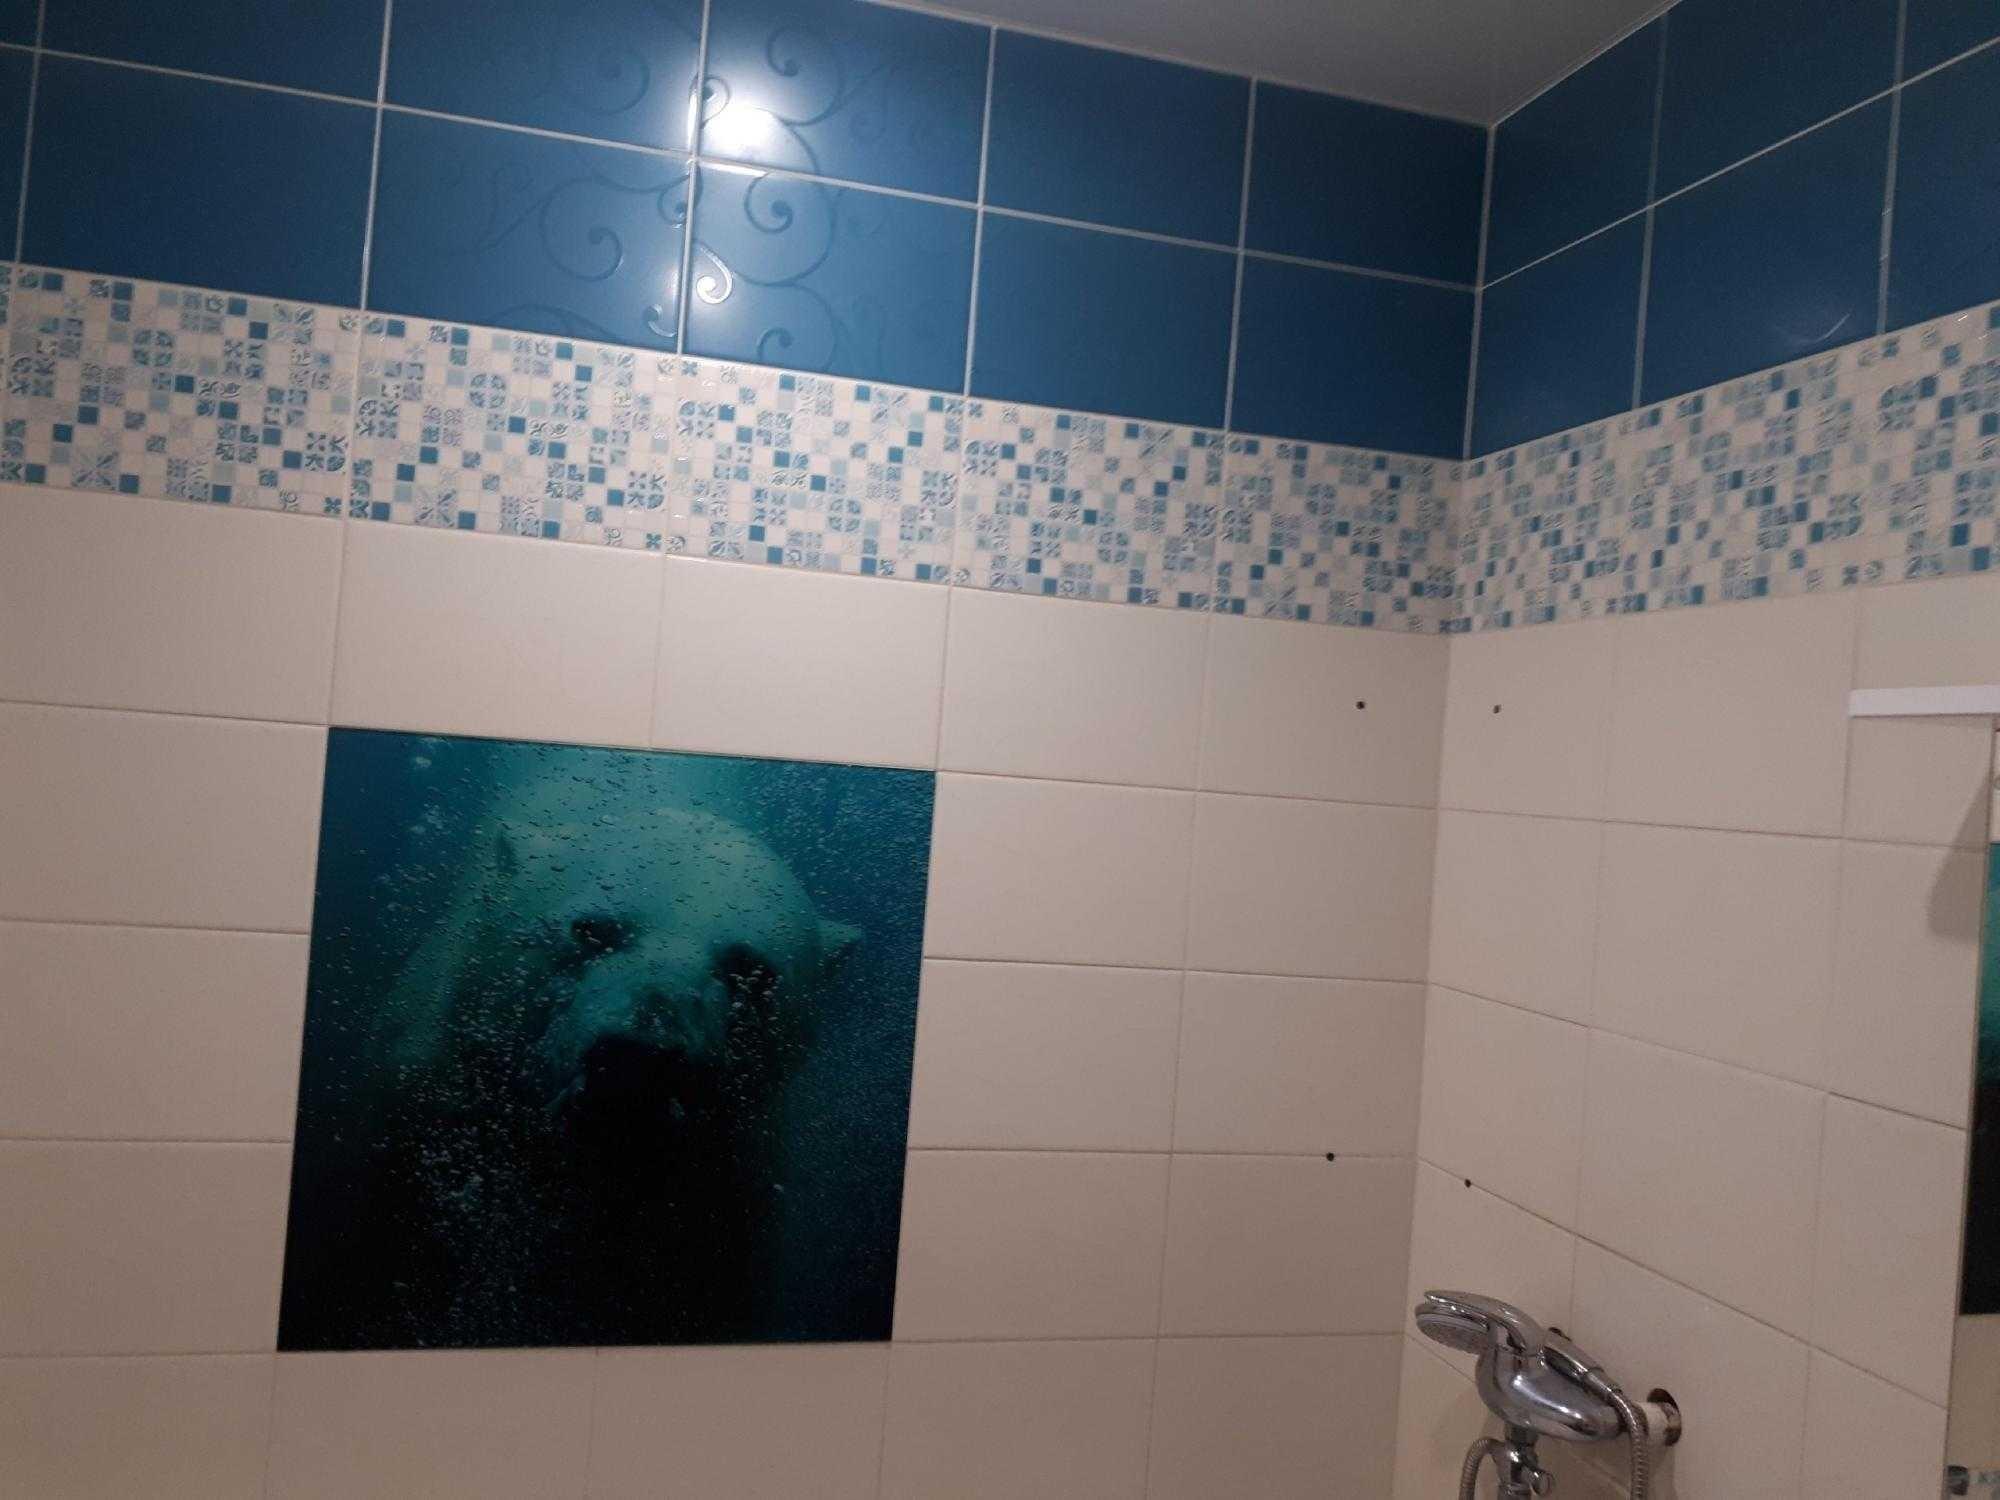 1к квартира улица Светлогорская, 21 | 13000 | аренда в Красноярске фото 9